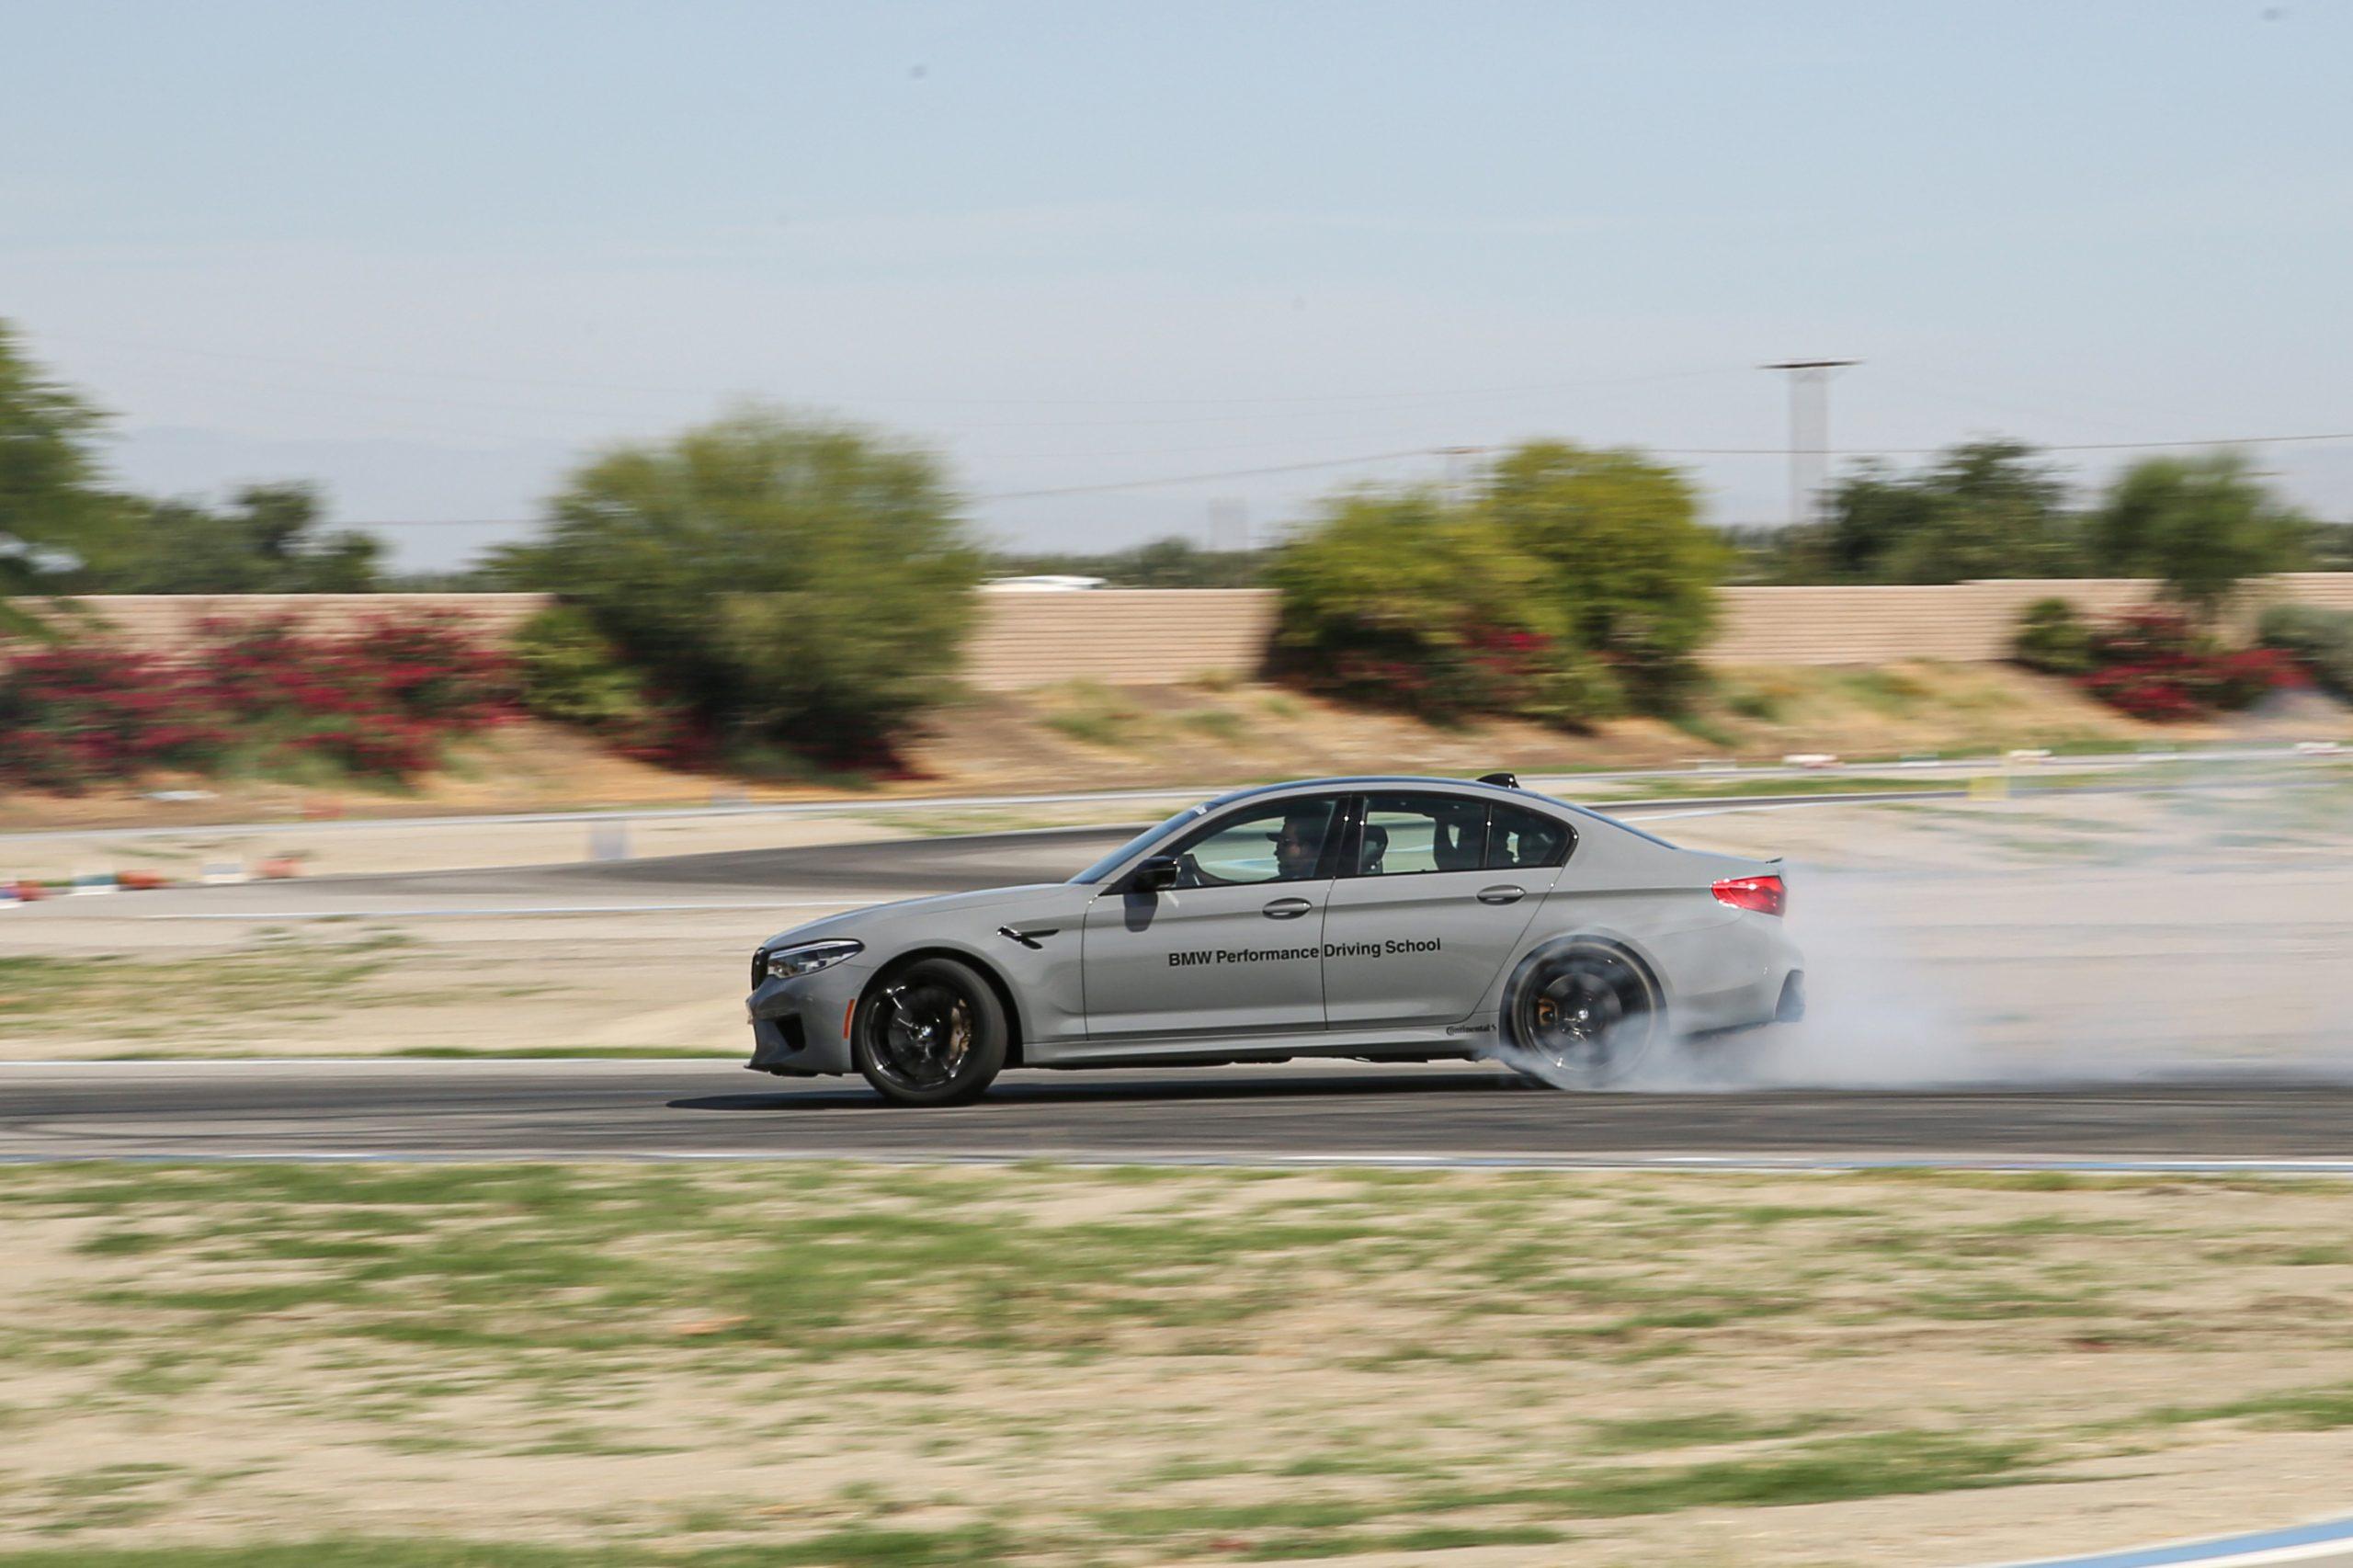 M5 BMW Performance Driving School